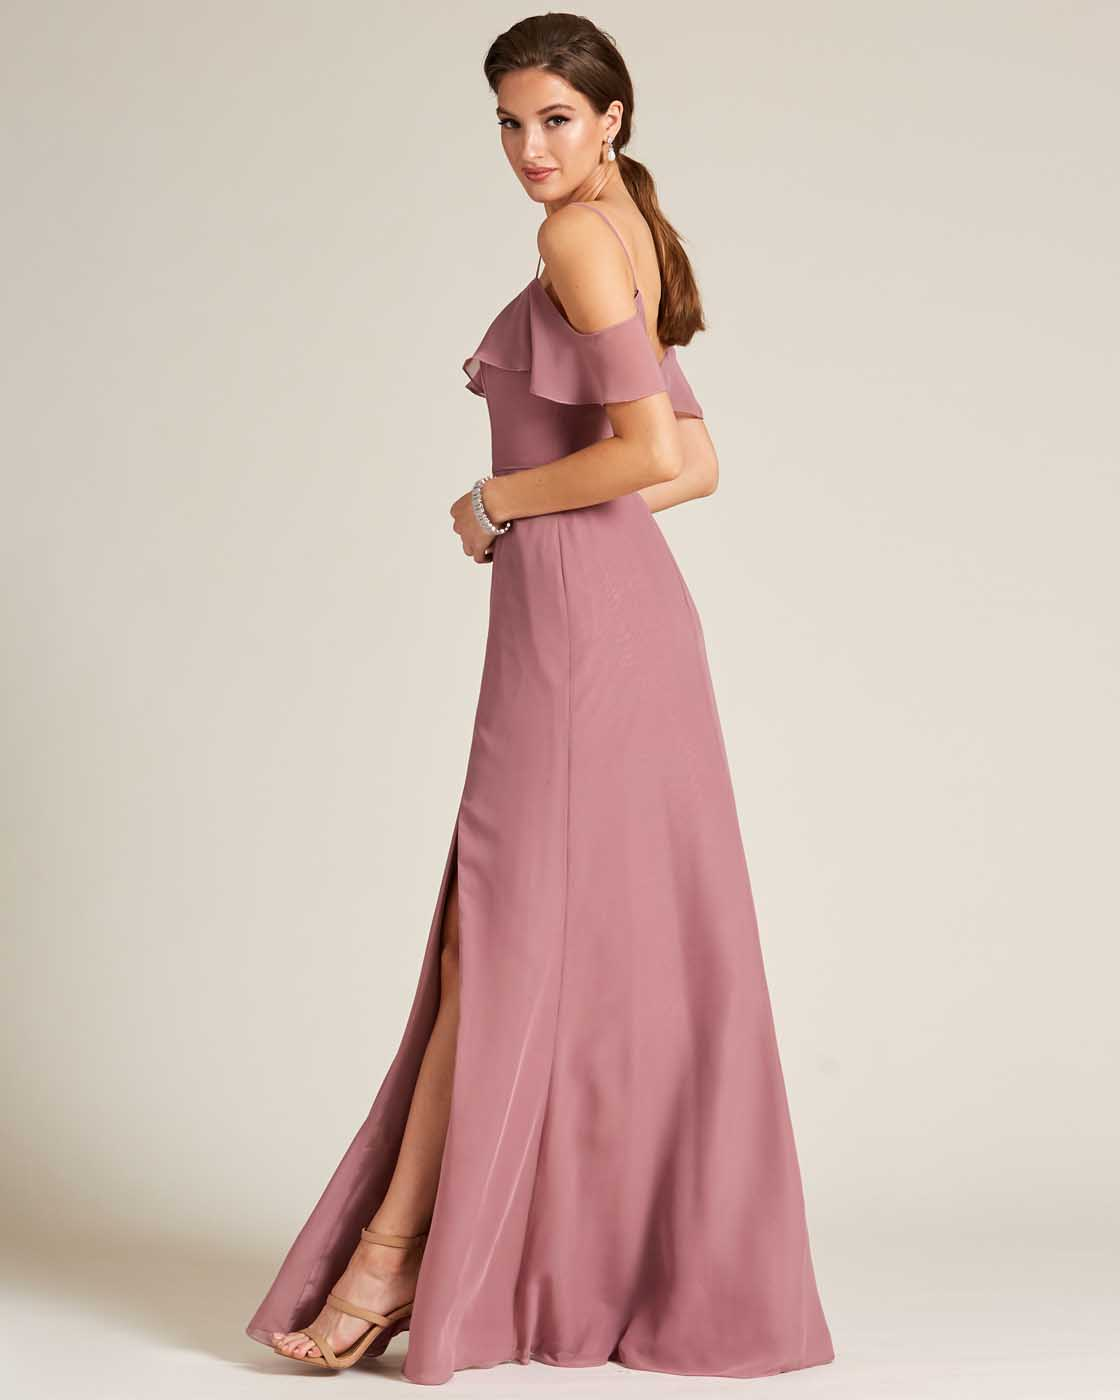 Rose Pink Layered Top Long Slit Skirt Dress - Side